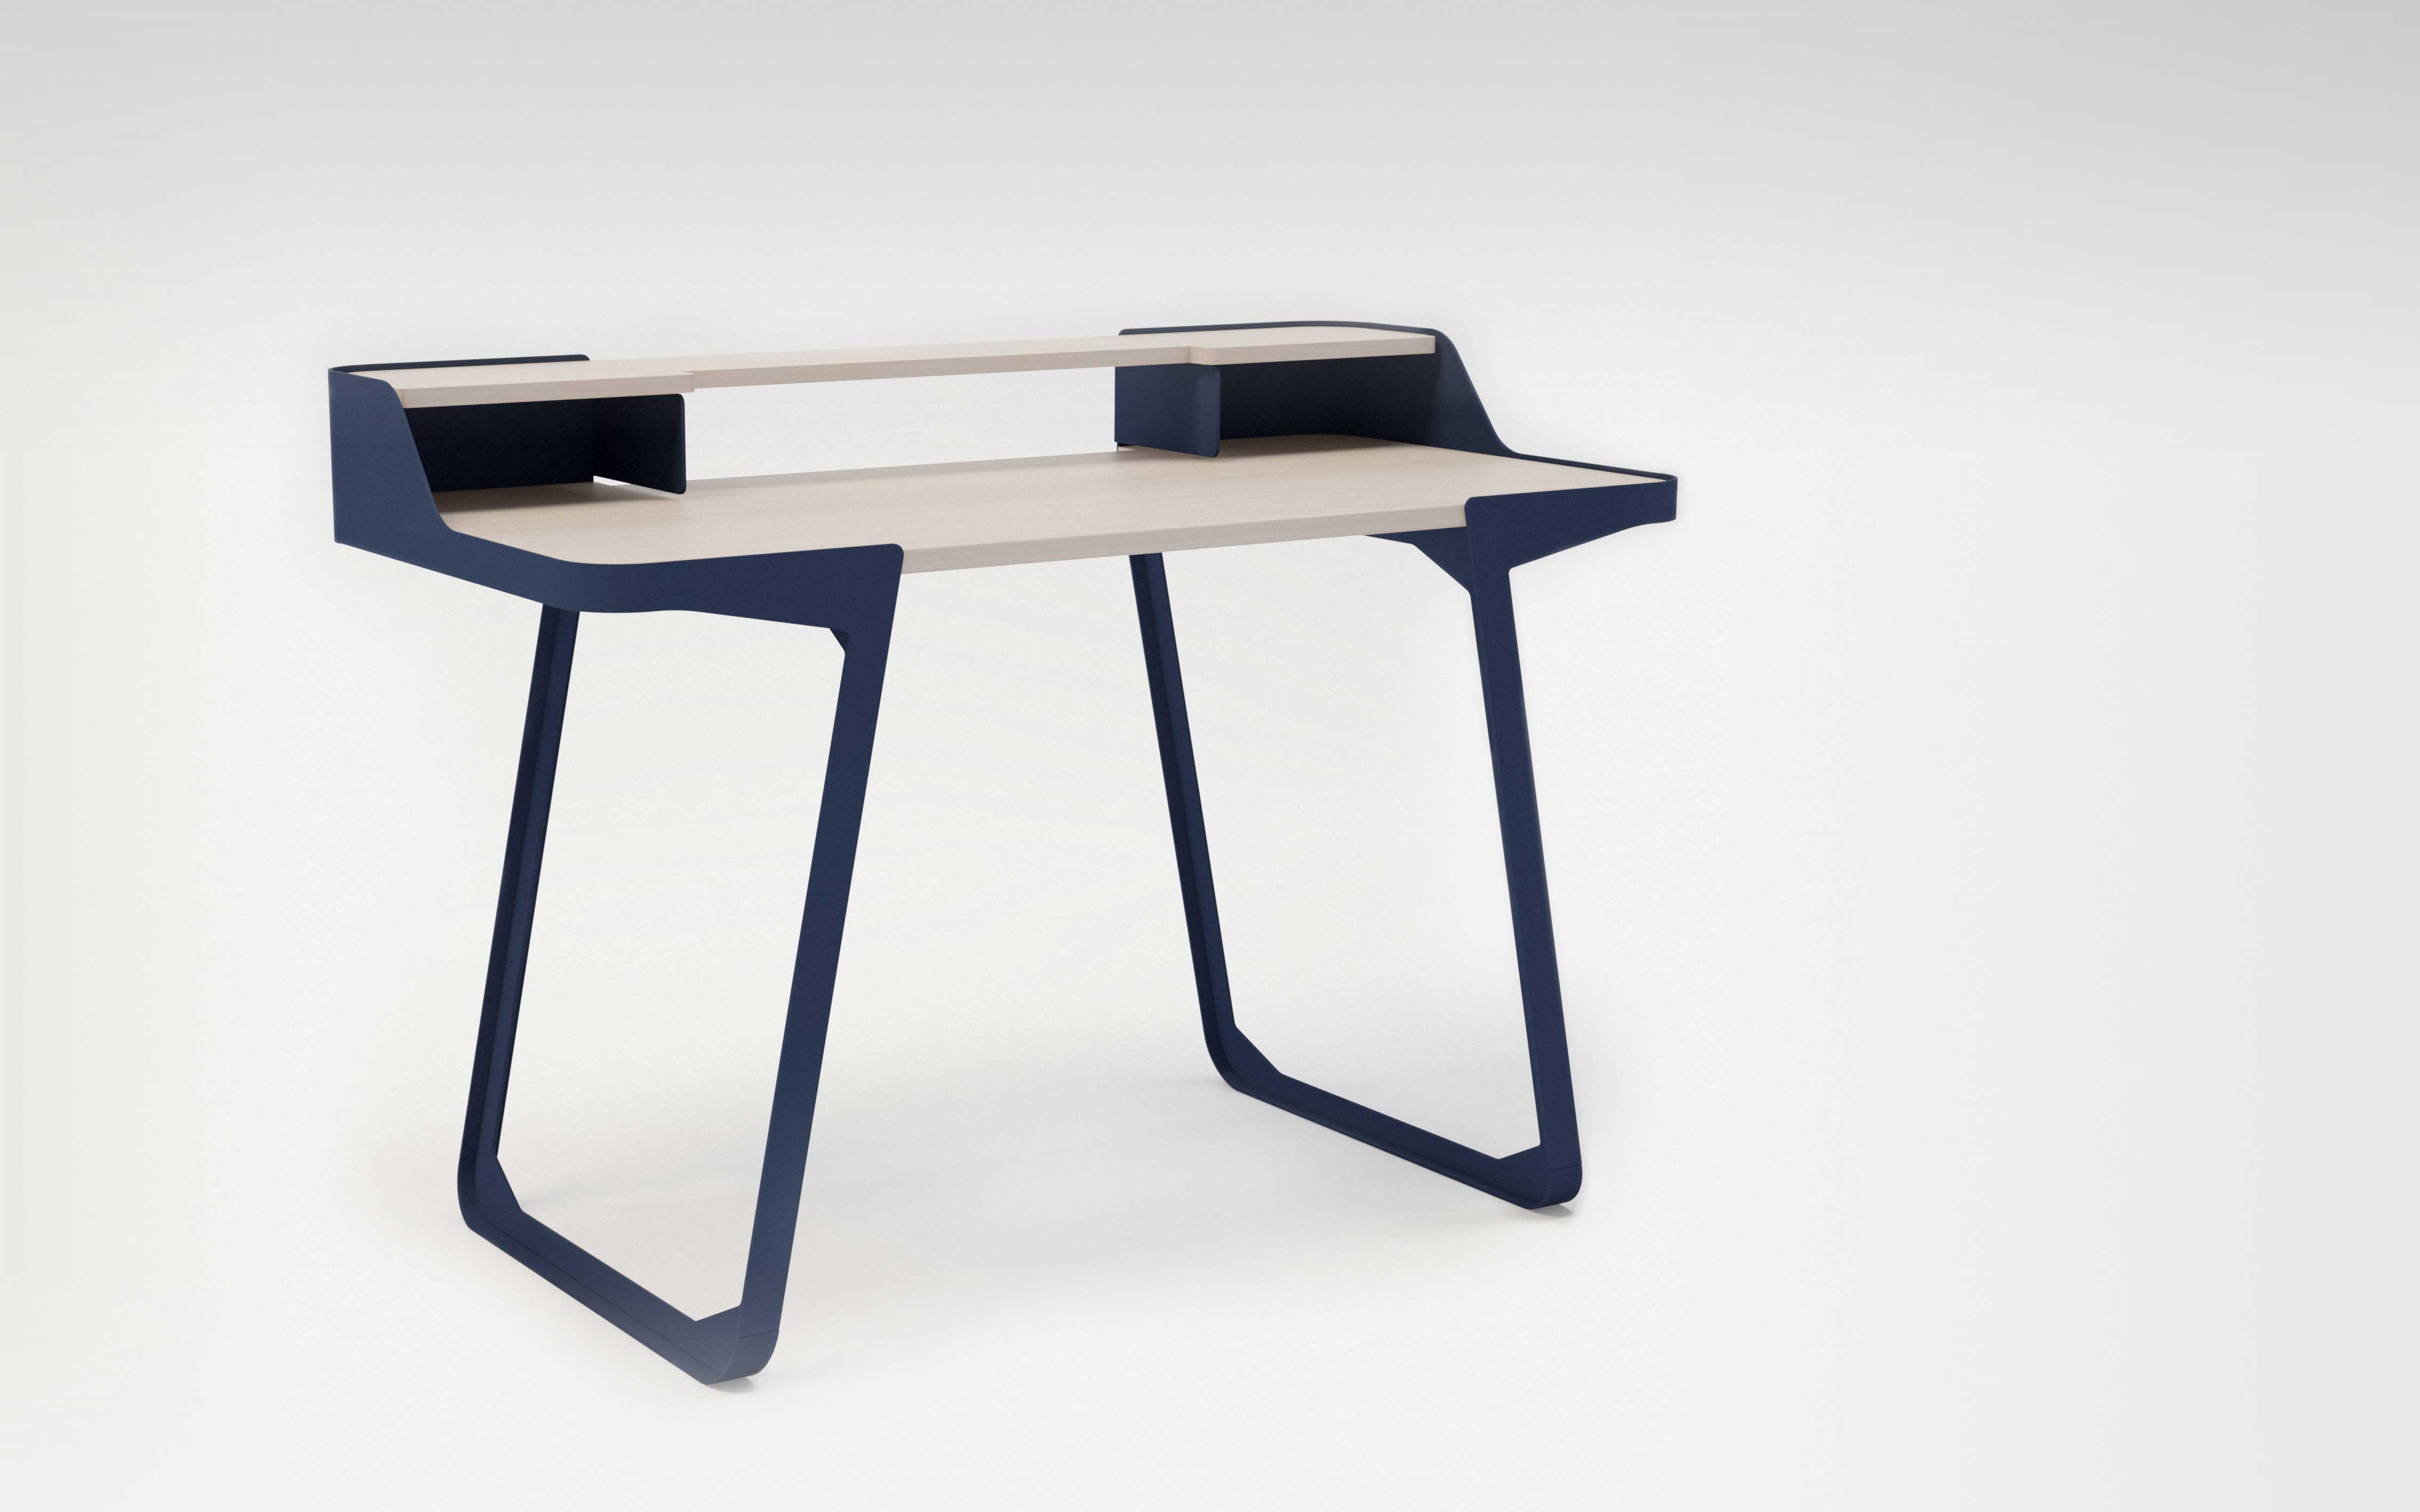 Bureau au design moderne - Bureau design moderne ...